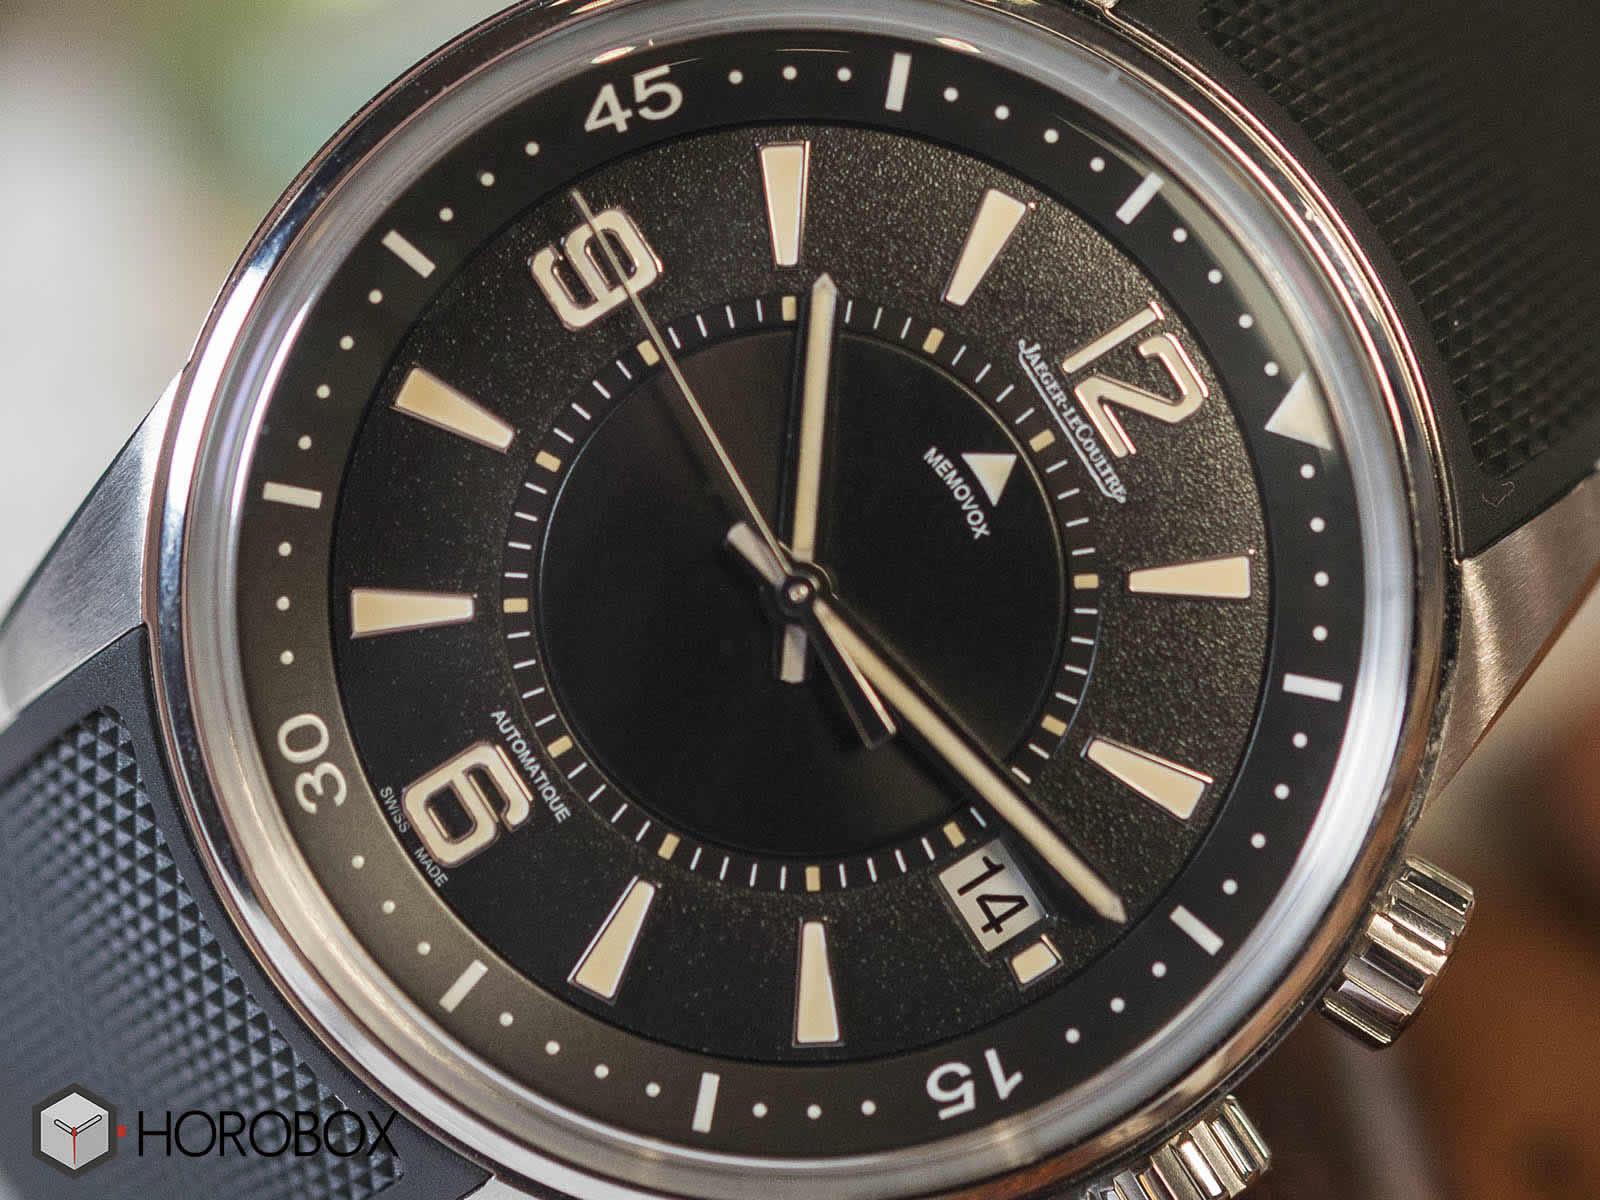 Jaeger-LeCoultre-Polaris-Memovox-9038670-4.jpg